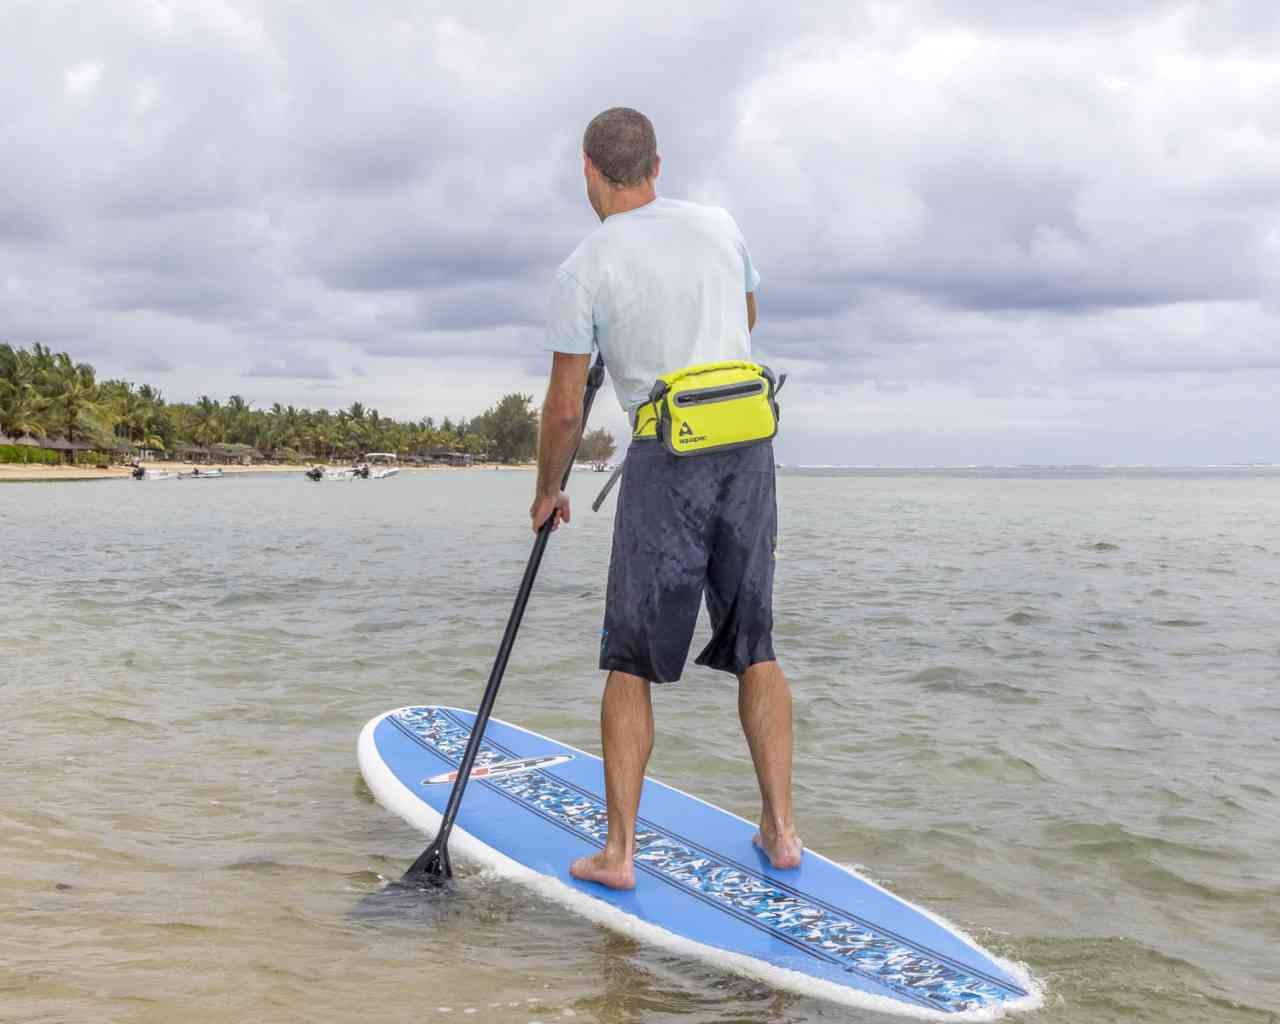 Водонепроницаемый чехол для документов - Aquapac 821. Aquapac - №1 в мире водонепроницаемых чехлов и сумок. Фото 11